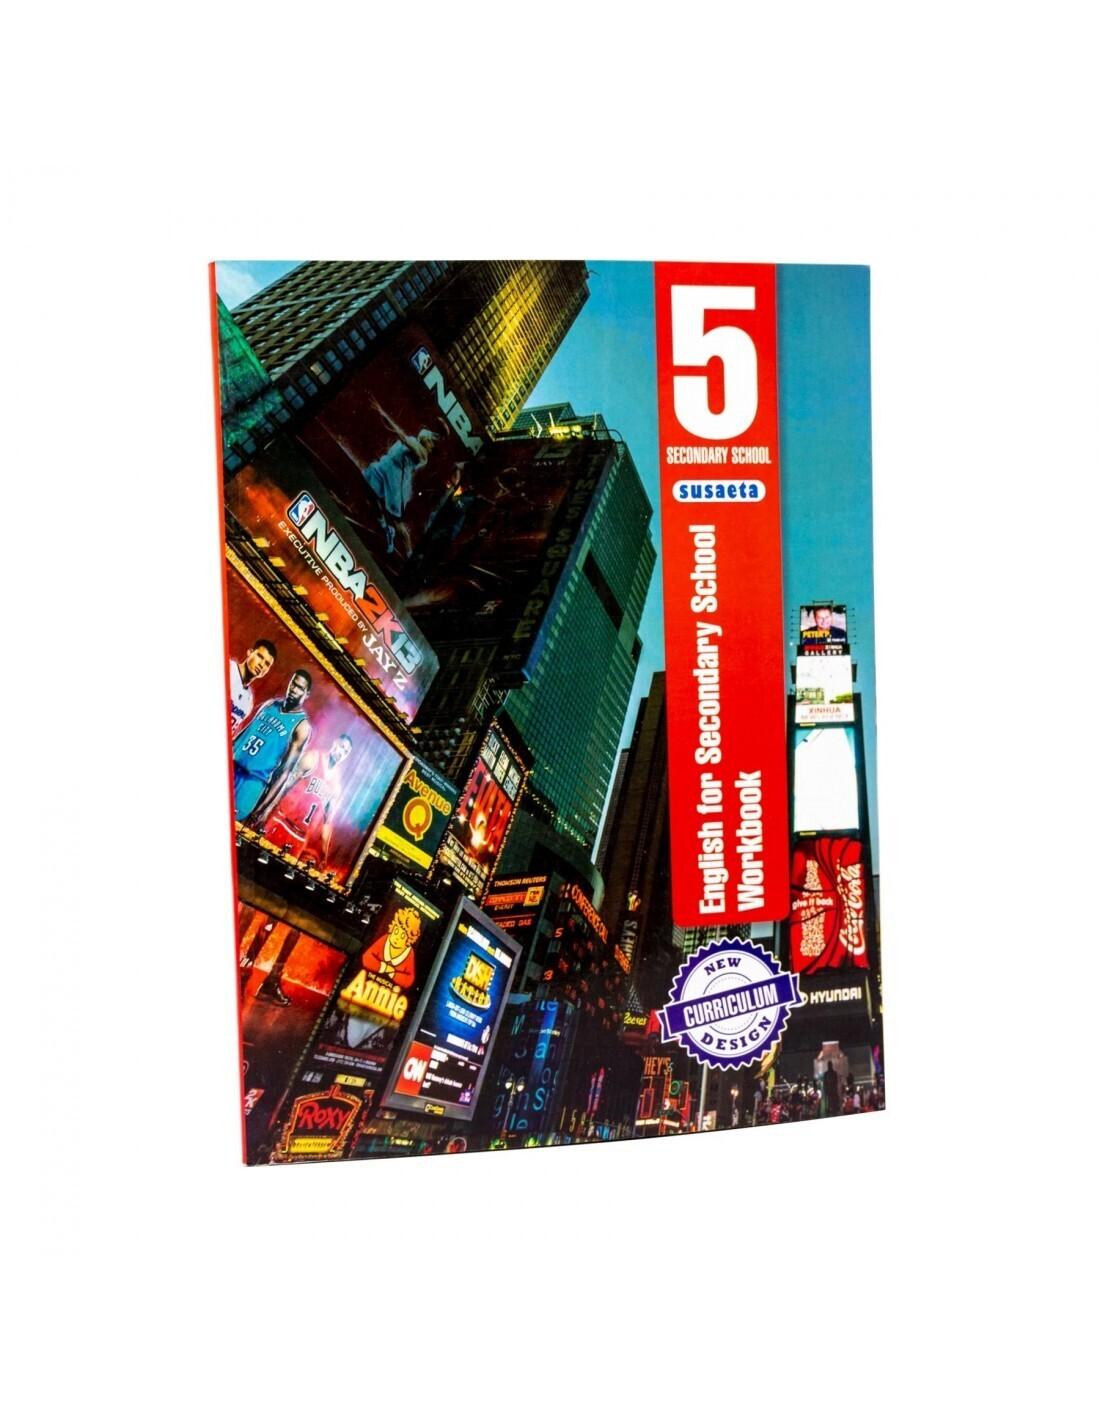 English for Secondary 5 - Workbook. Susaeta